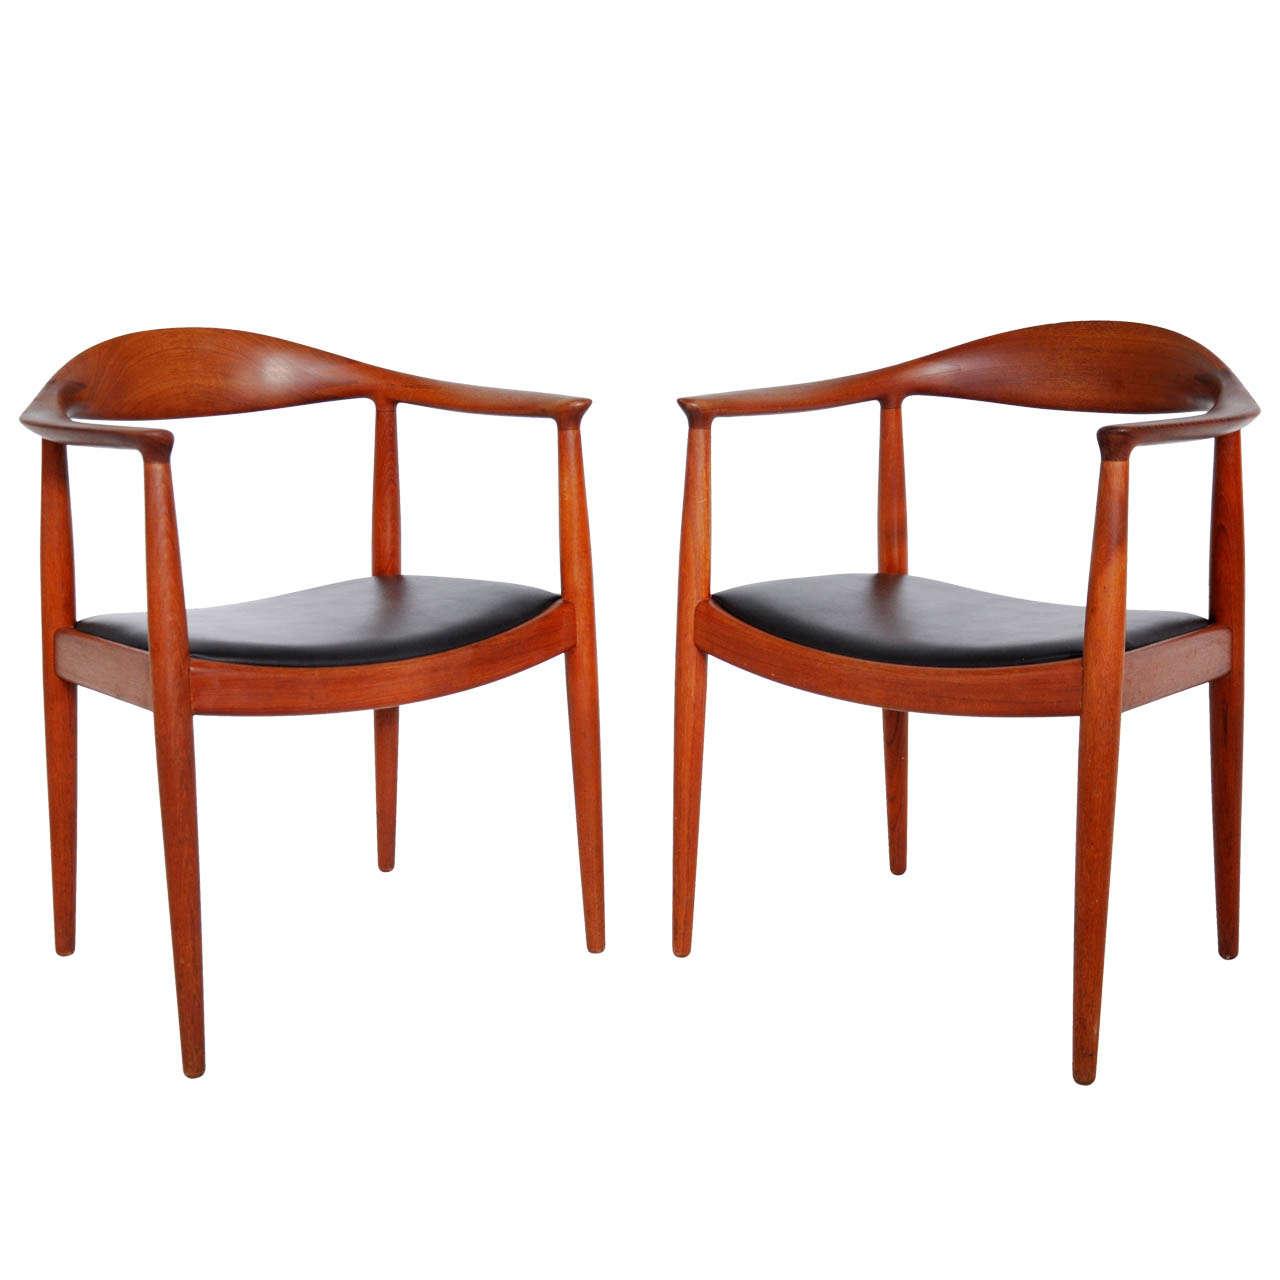 Chairs by Hans Wegner